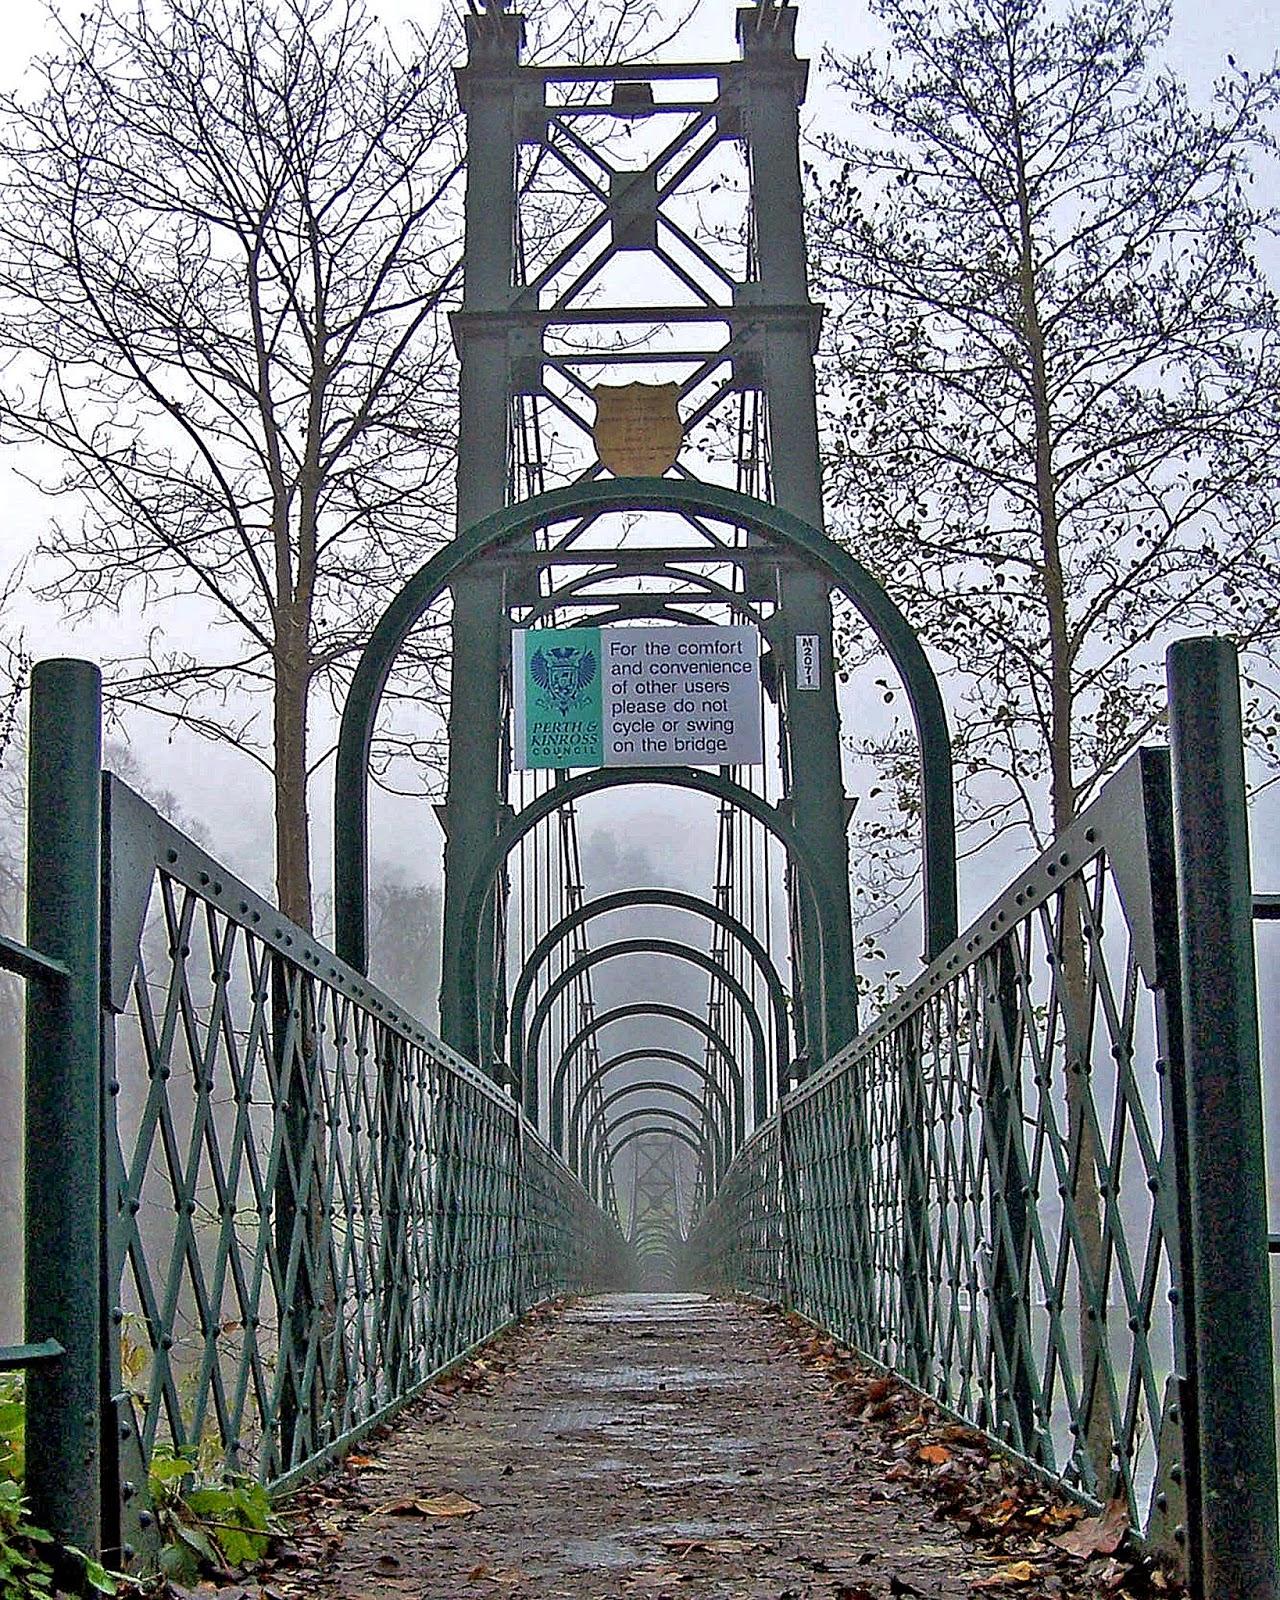 Cluny Bridge Pitlochry Perthshire Scotland